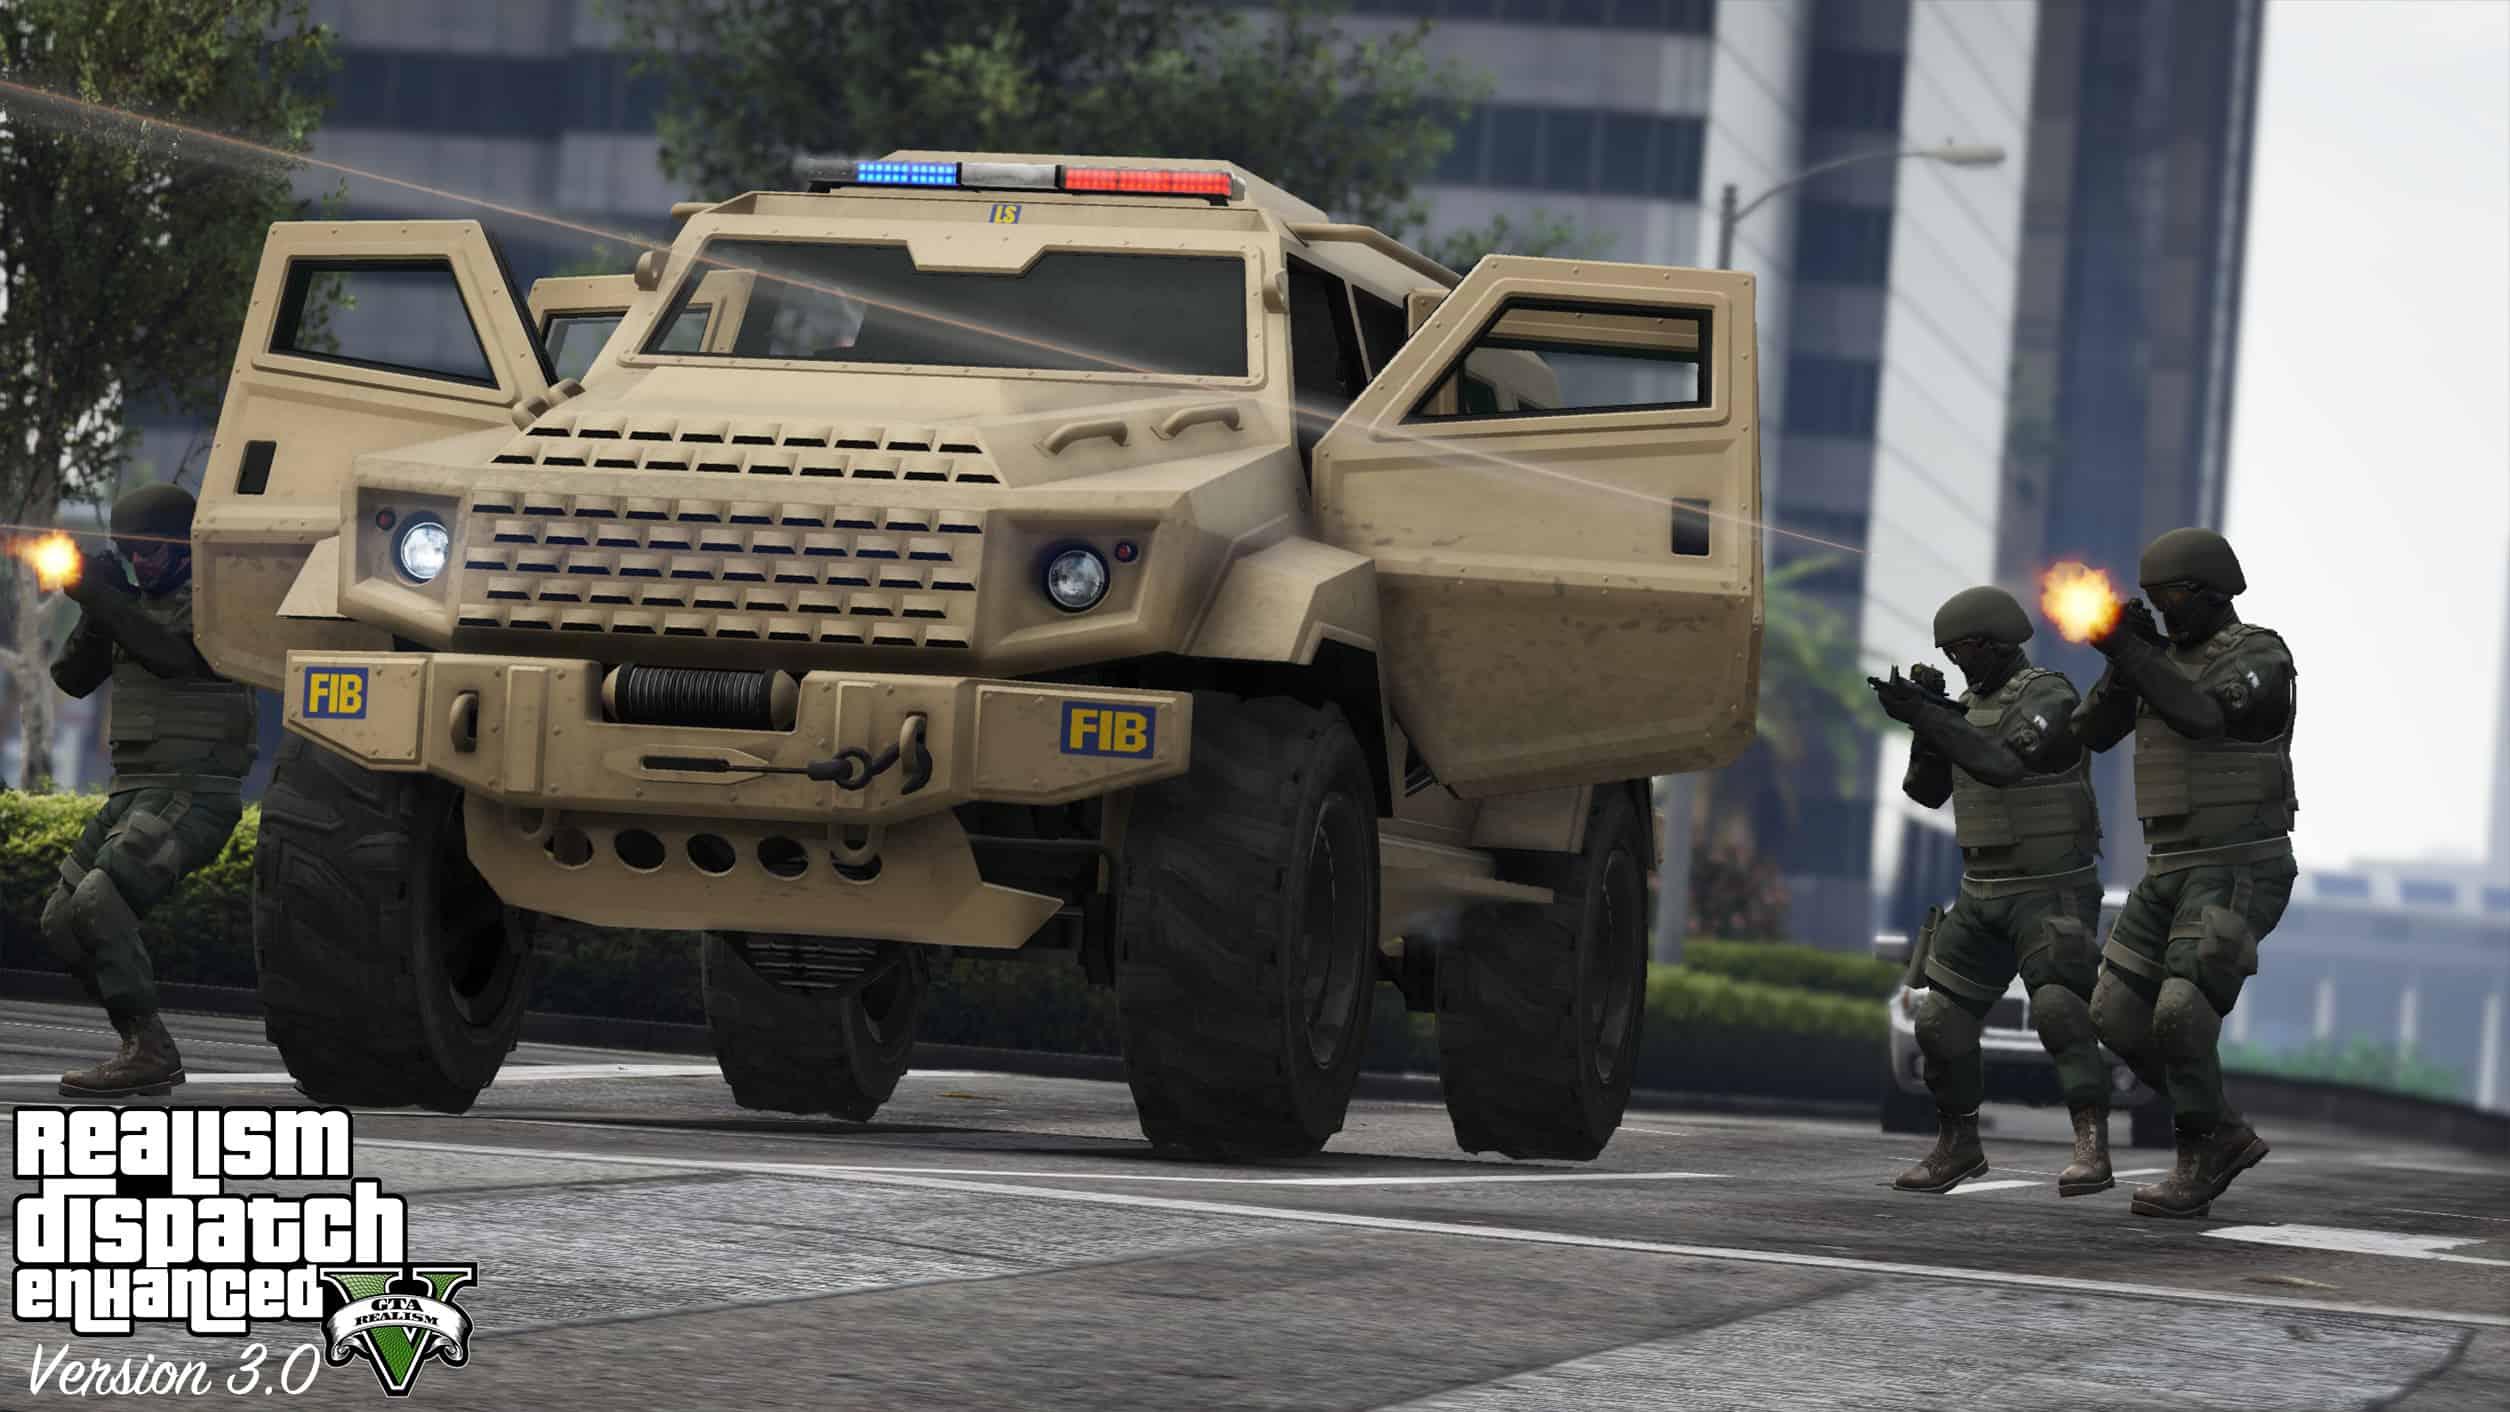 Best GTA 5 Mods - Realism Dispatch Enhancer